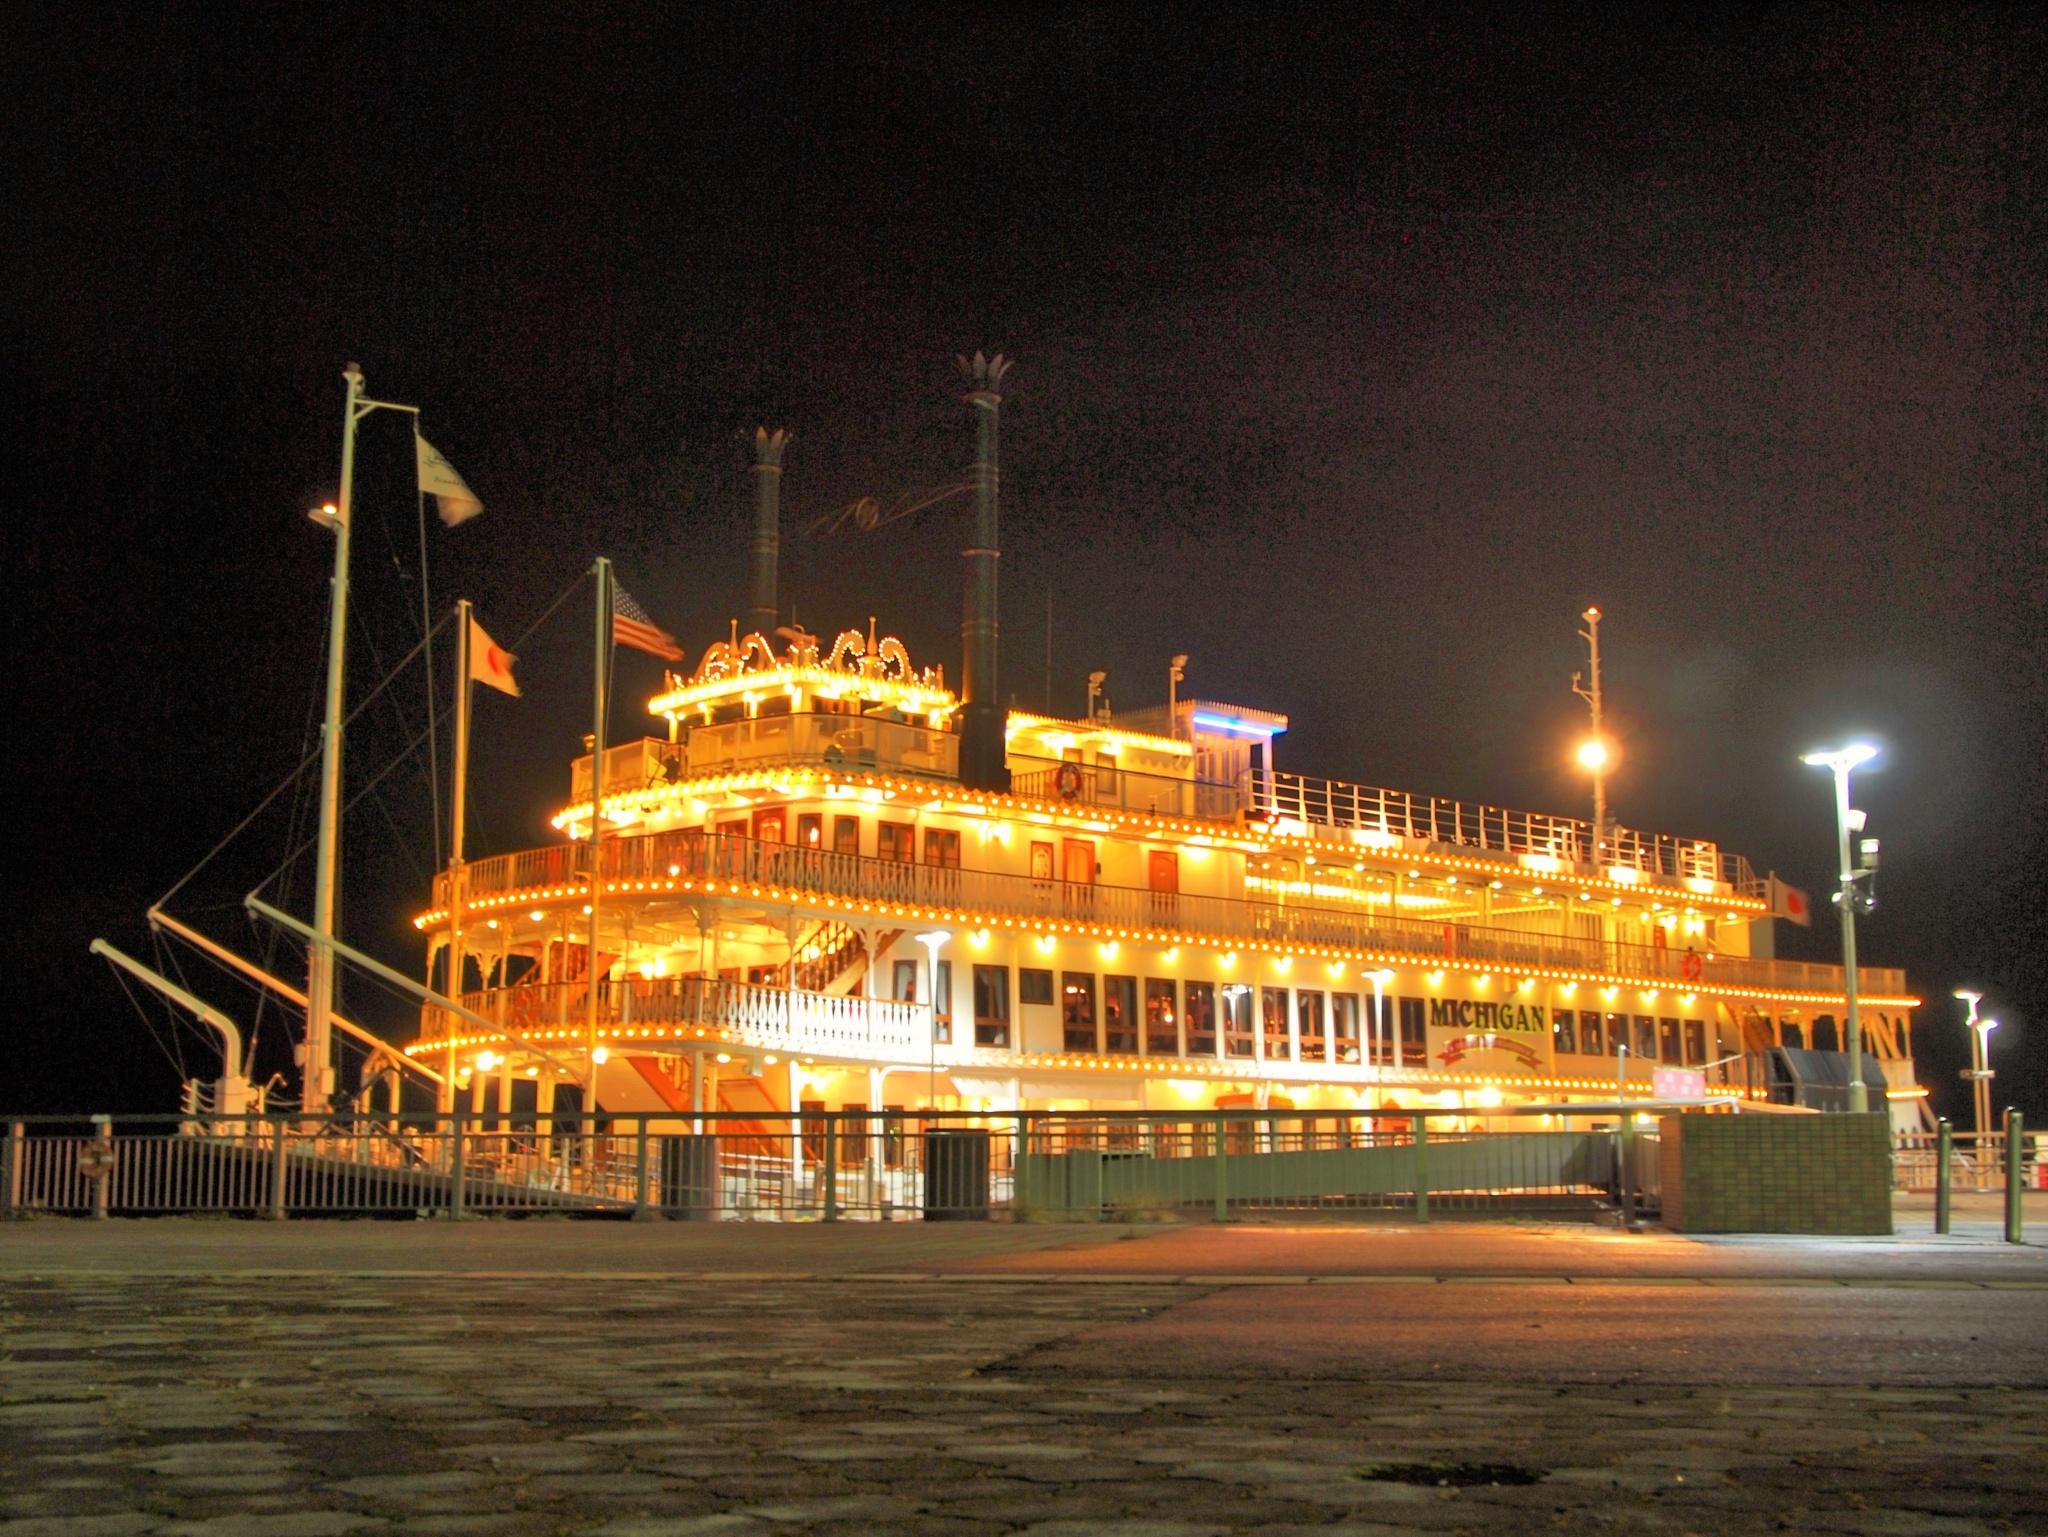 Michigan ship light up berth   by SANRI